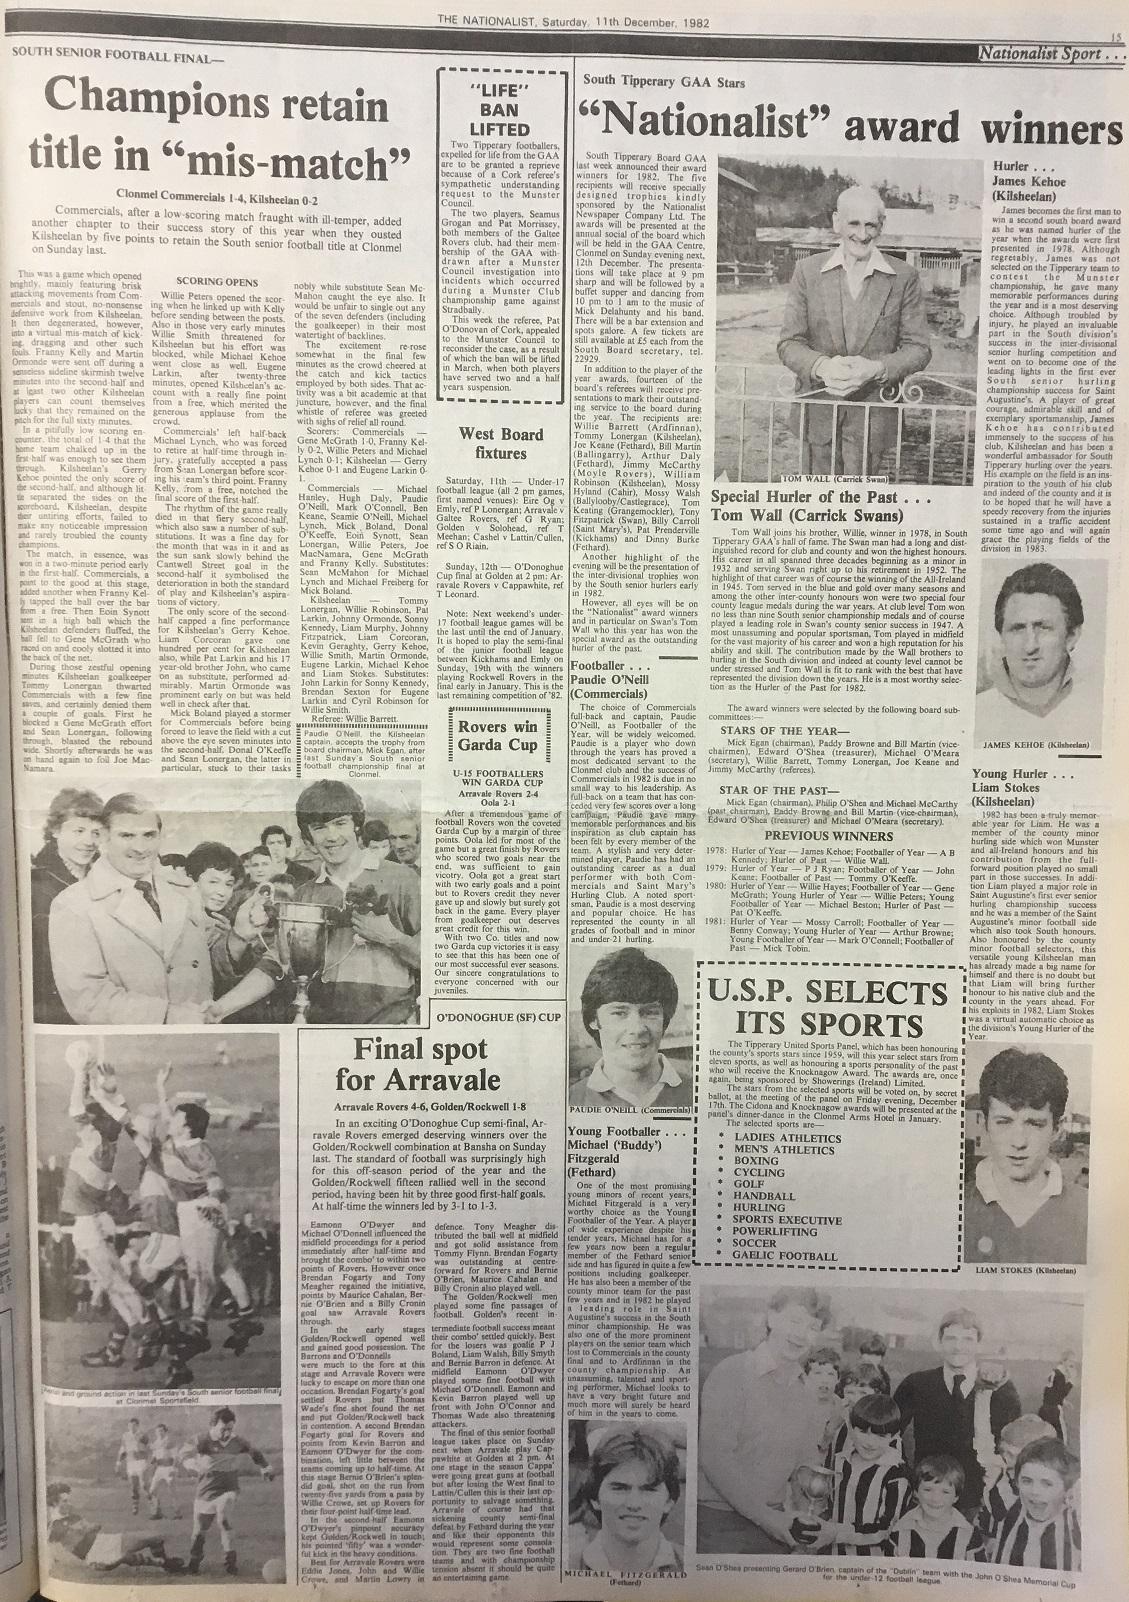 1982 South football final